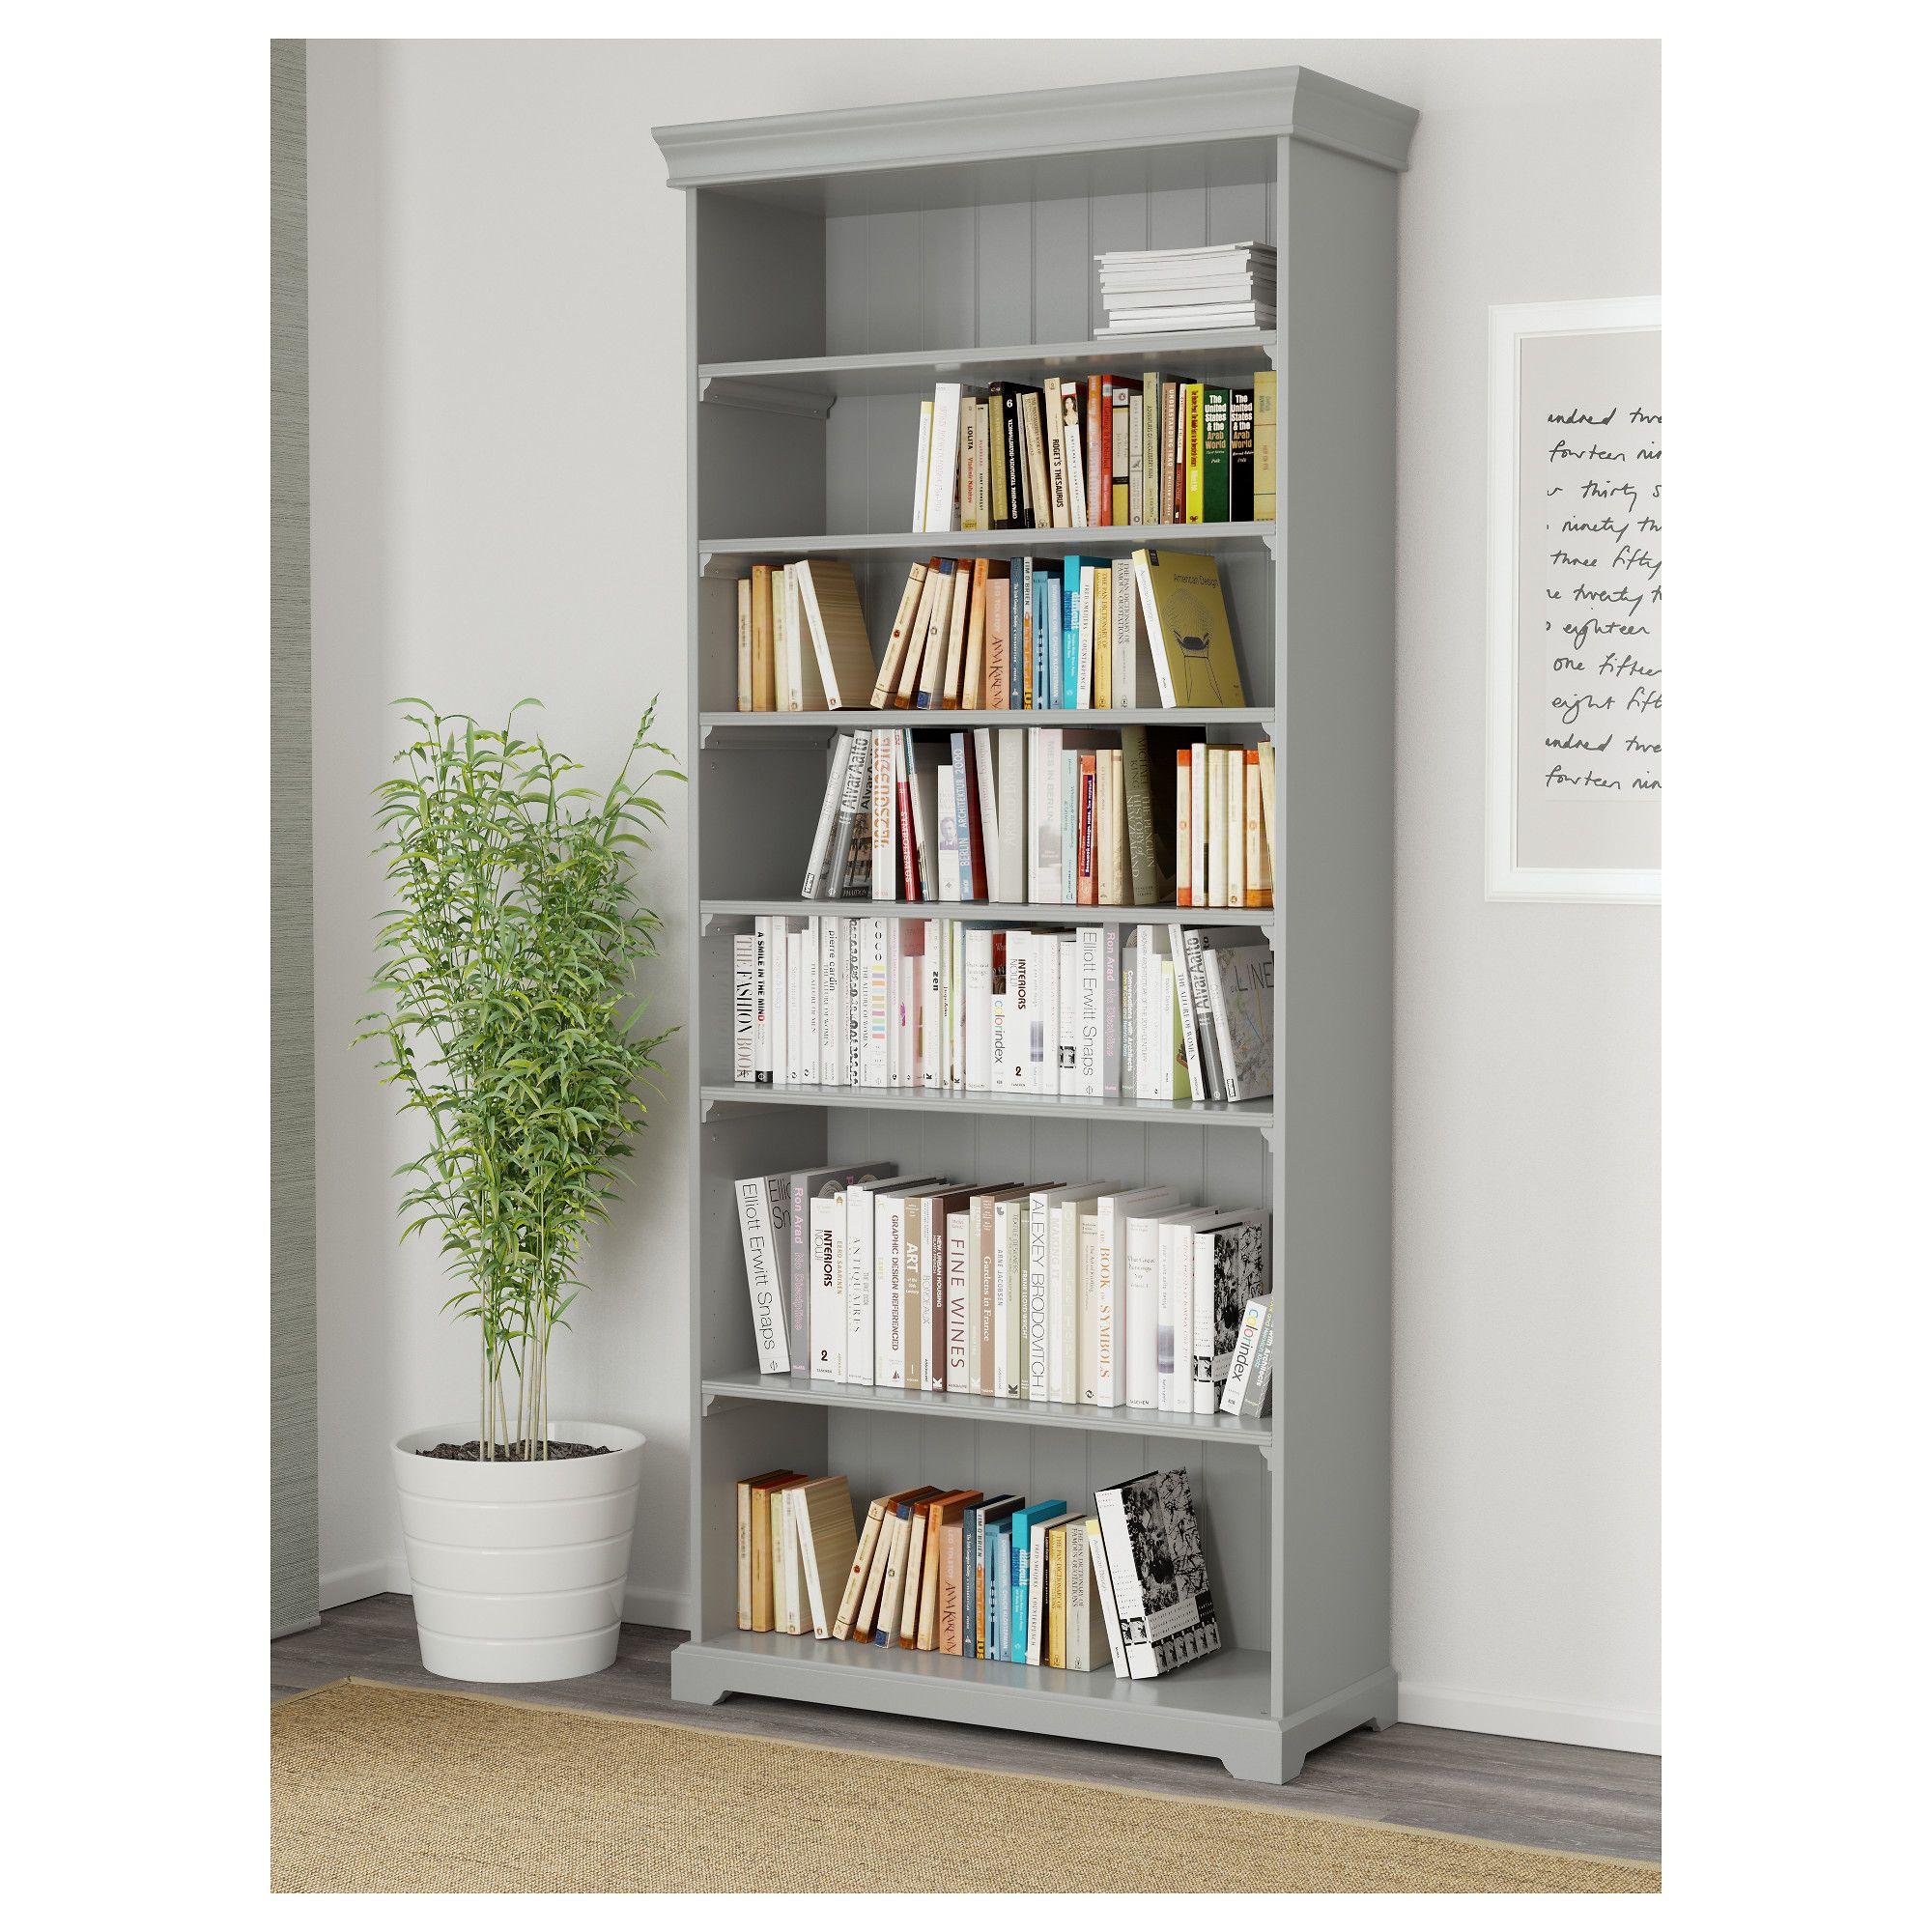 LIATORP Bookcase, gray | Liatorp, Cornice and Shelves